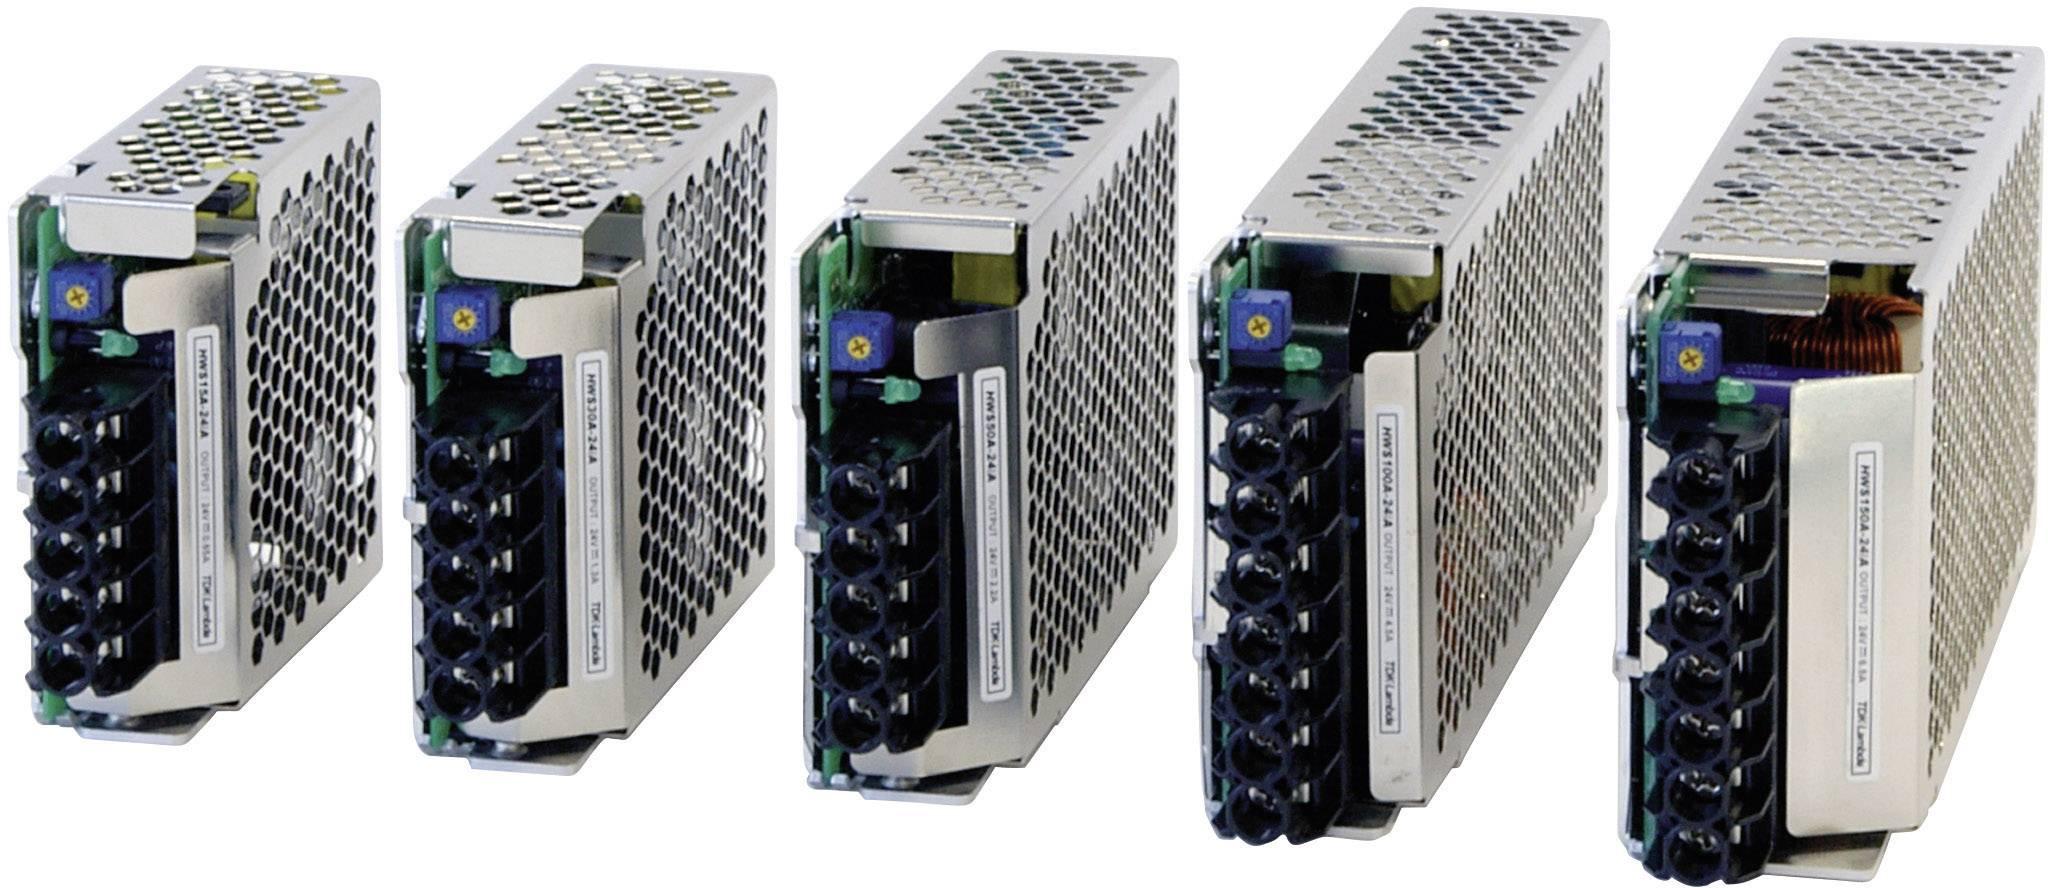 Zabudovateľný napájací zdroj TDK-Lambda HWS-30A-48, 48 V, 31,2 W